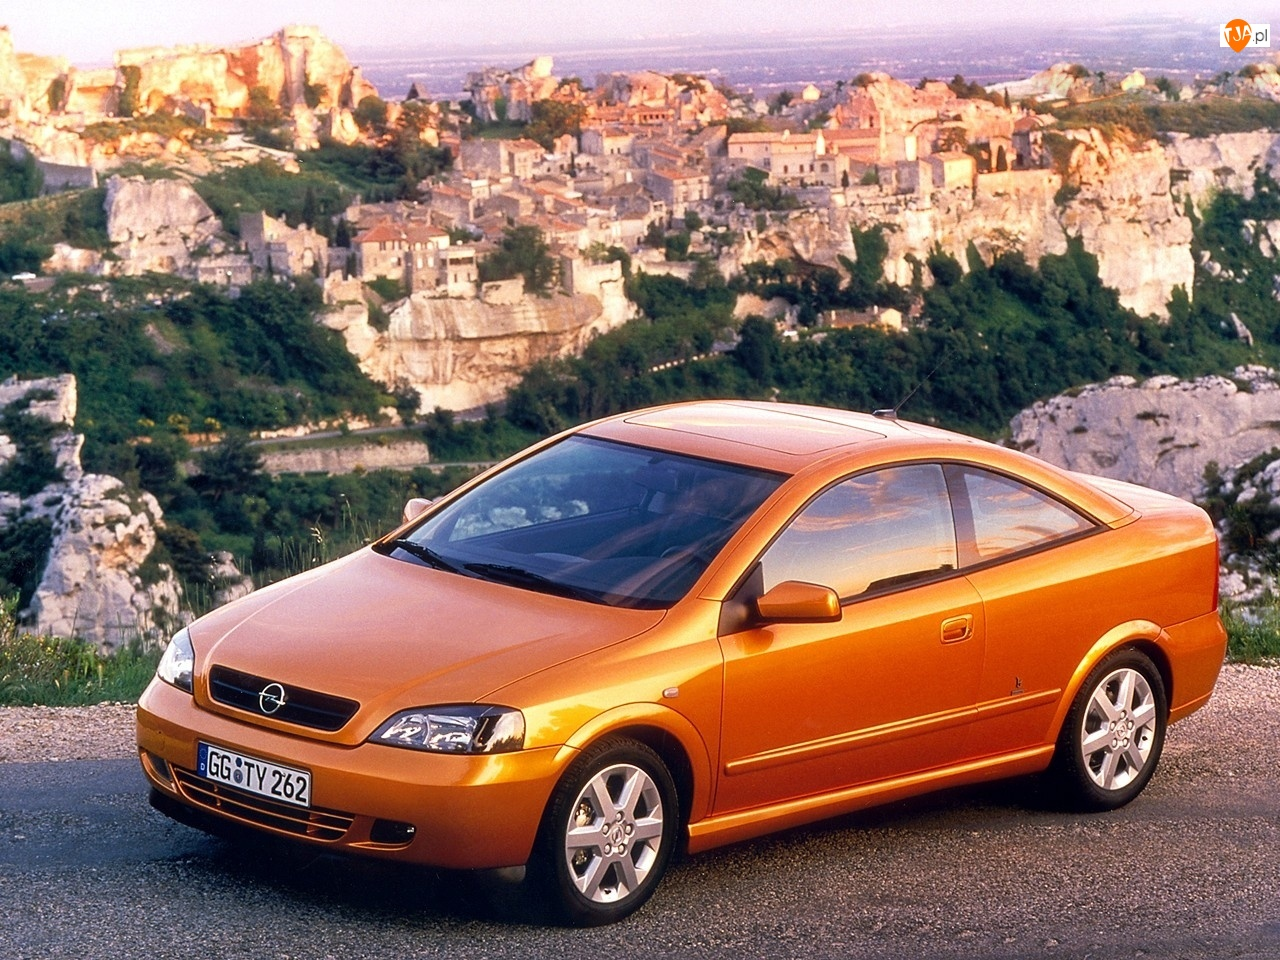 Skały, Opel, Coupe, Astra, Bertone